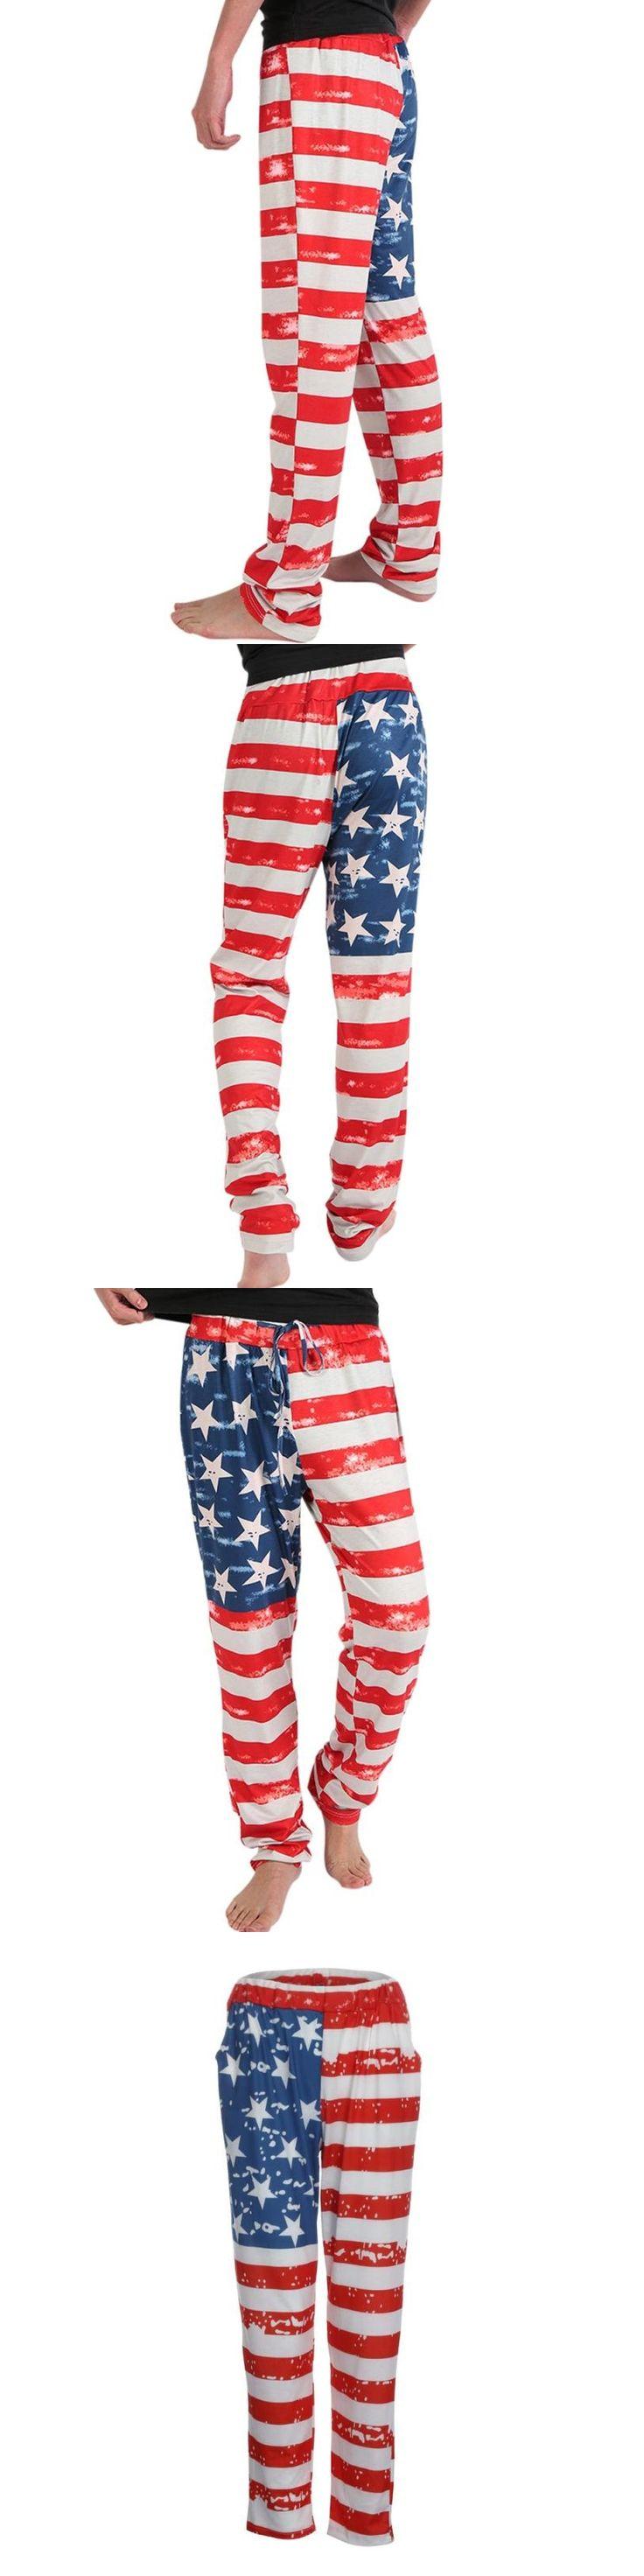 Spring and Autumn models Casual Men American Flag Printed Drawstring Pants Fashion Leggings Hot Sale Pantalon Harlan #AA